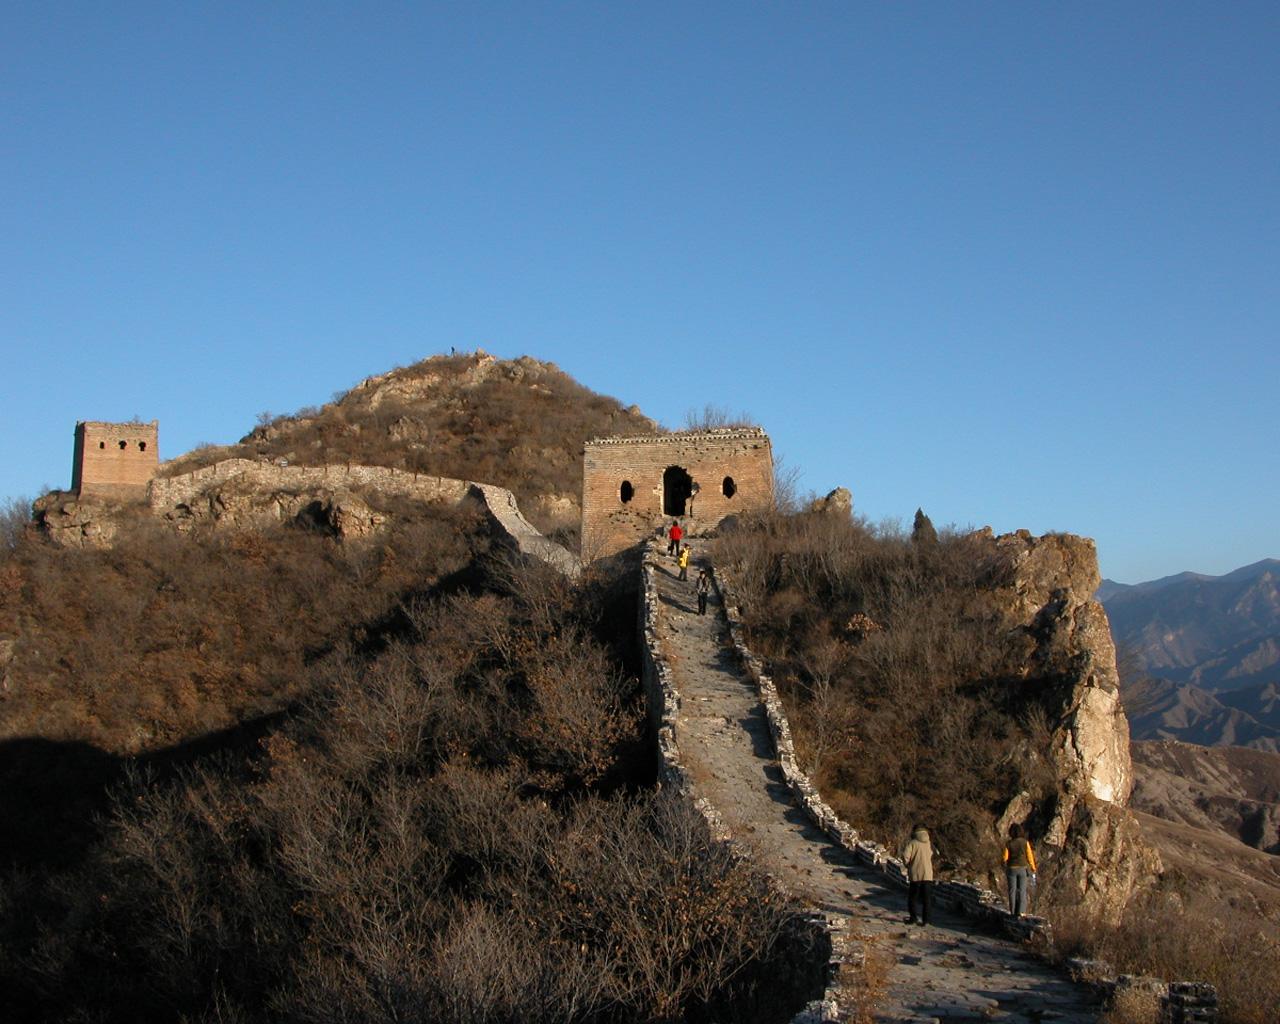 http://2.bp.blogspot.com/-FALr85mKO_Y/TtnoFOqS8AI/AAAAAAAAEGY/HeBERMsz2KI/s1600/Simatai+Great+Wall.jpg